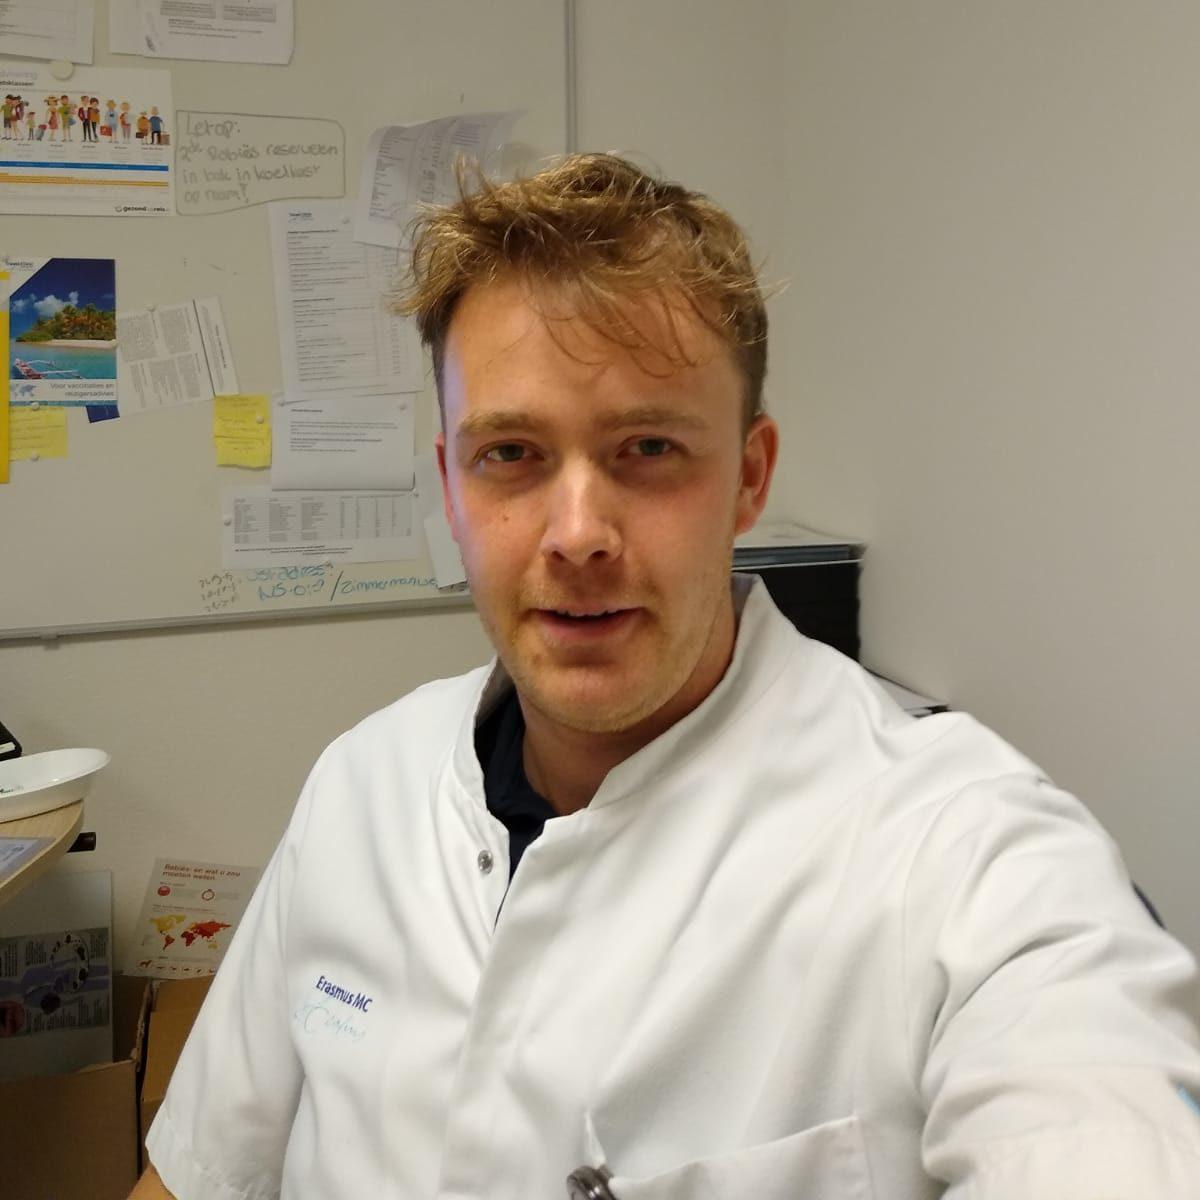 Matthijs Raadsen